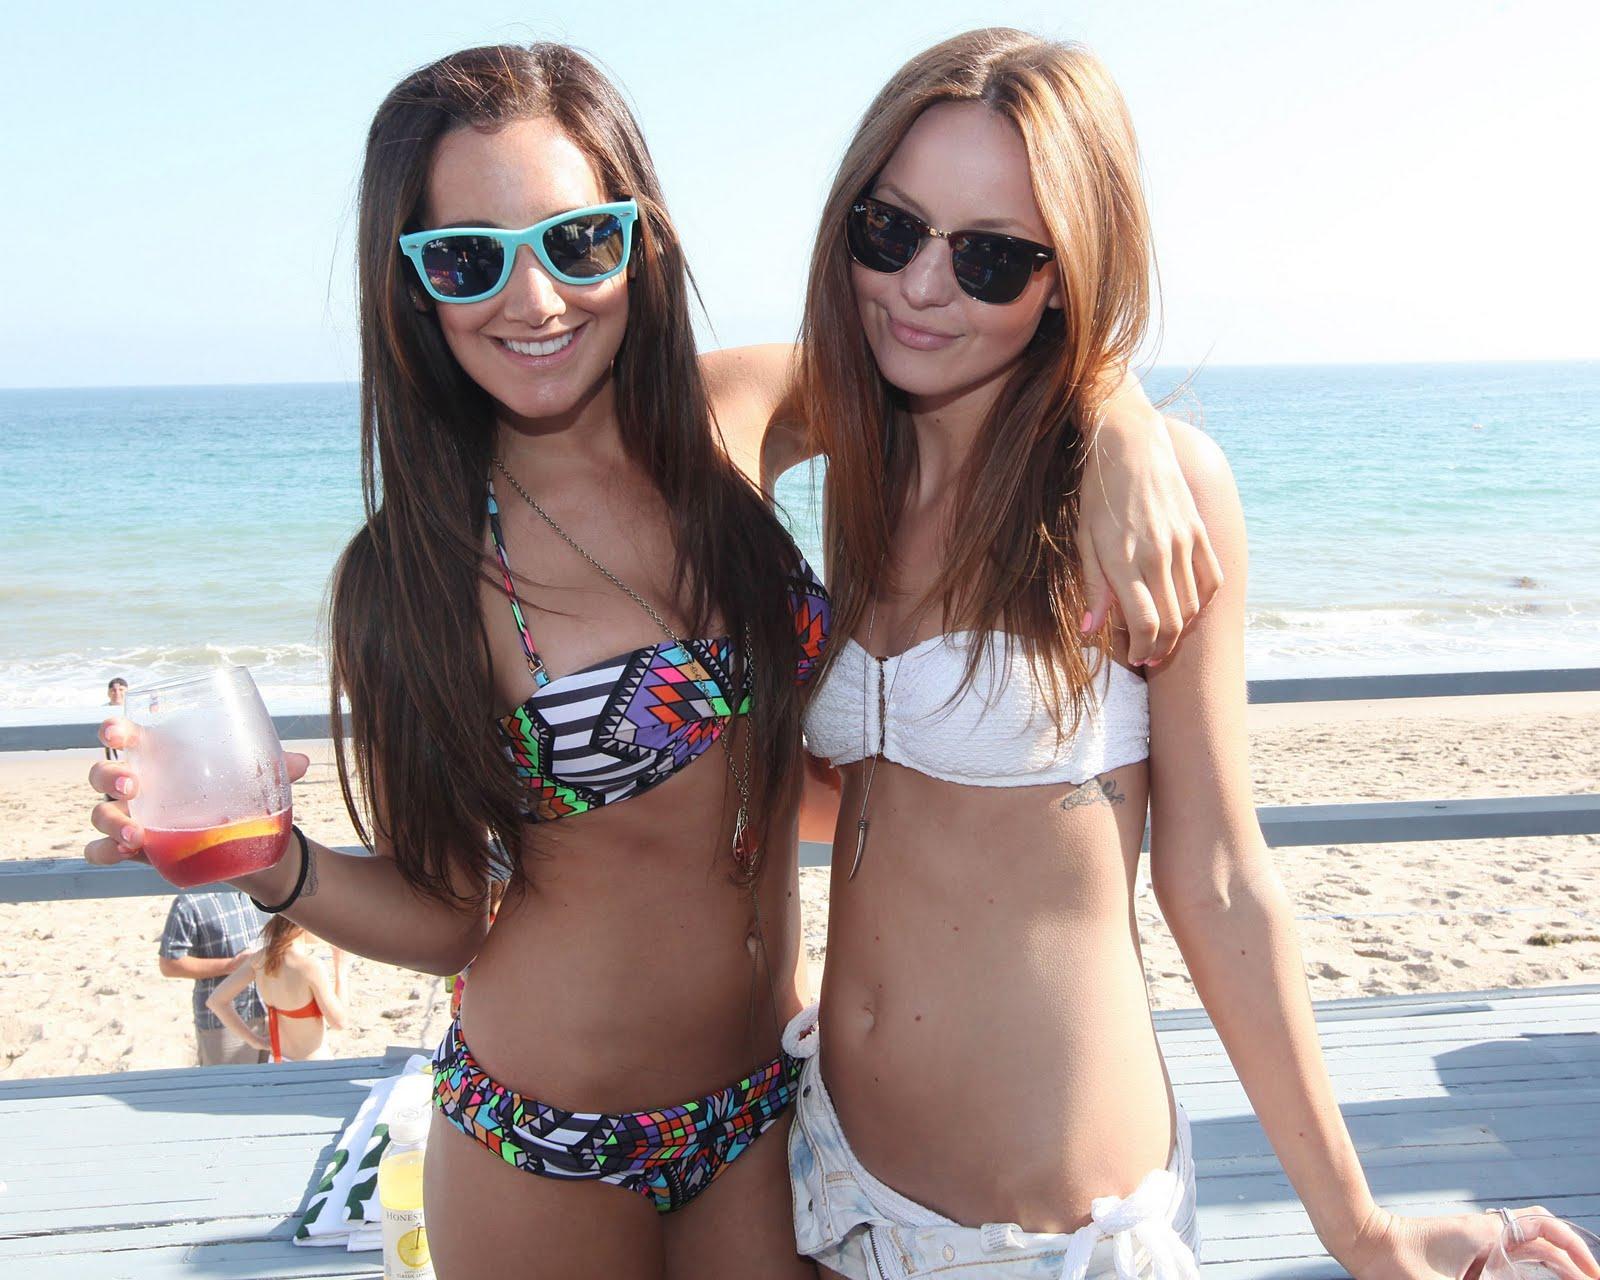 ashley-tisdale-bikini-body-girls-photo-porn